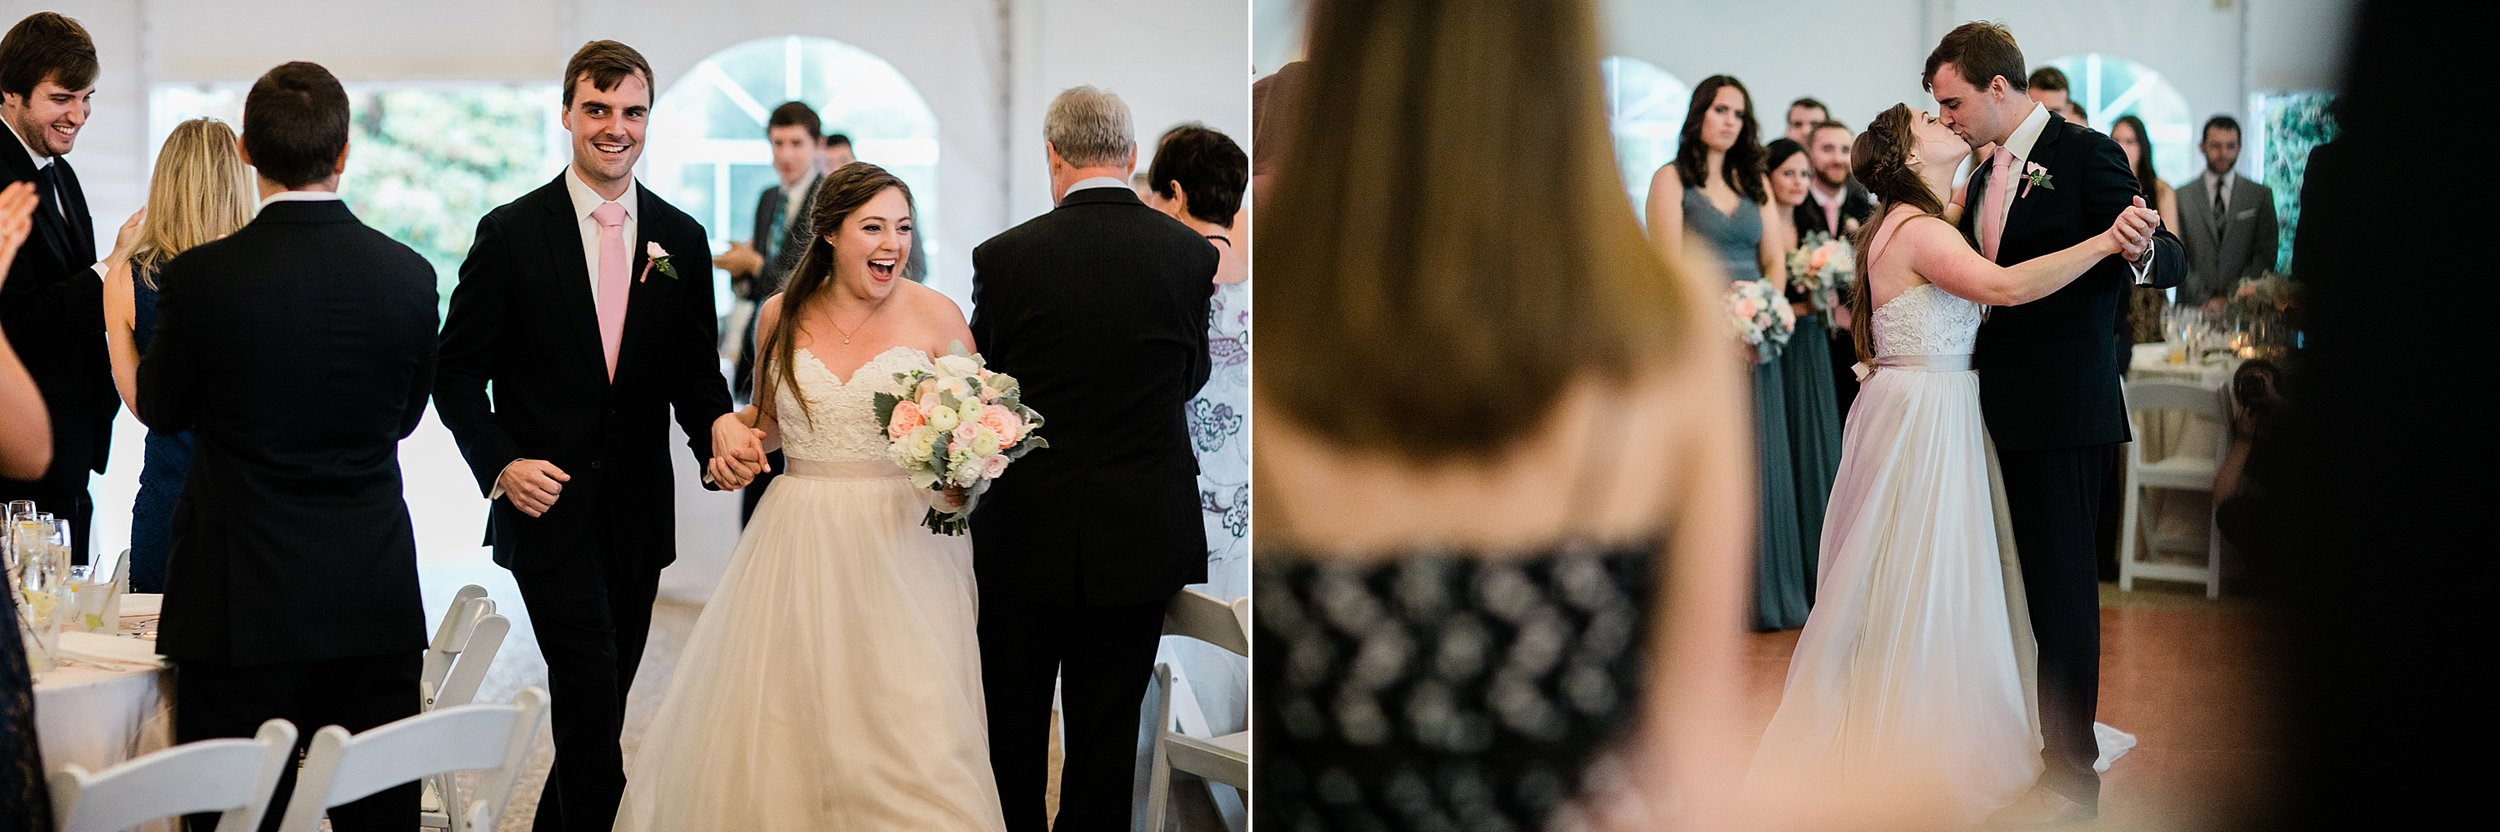 041 los angeles wedding photographer todd danforth photography boston.jpg